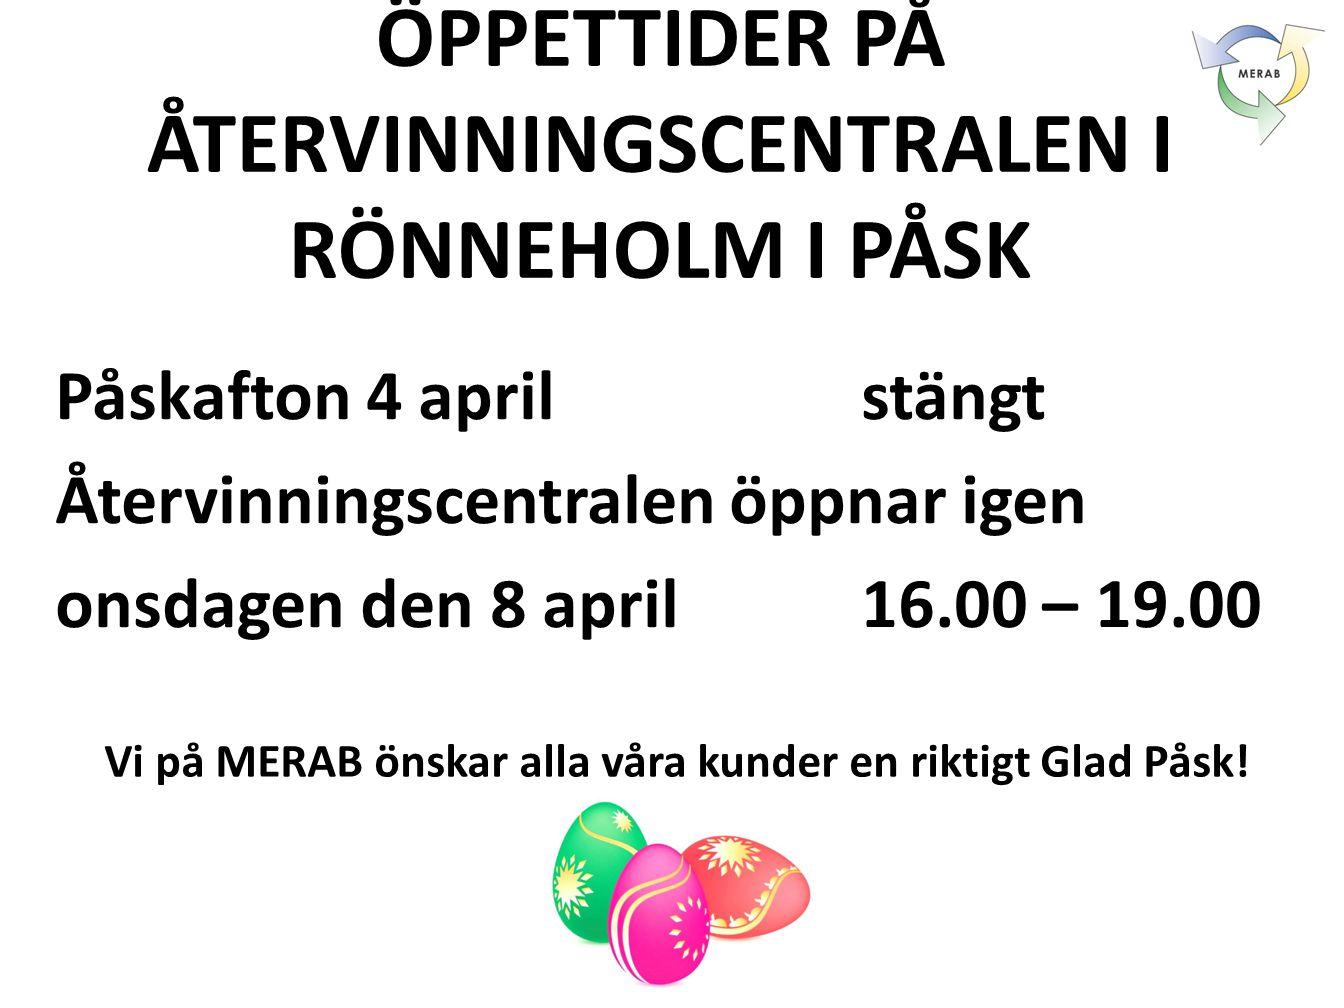 ÖPPETTIDER PÅ ÅTERVINNINGSCENTRALEN I RÖNNEHOLM I PÅSK